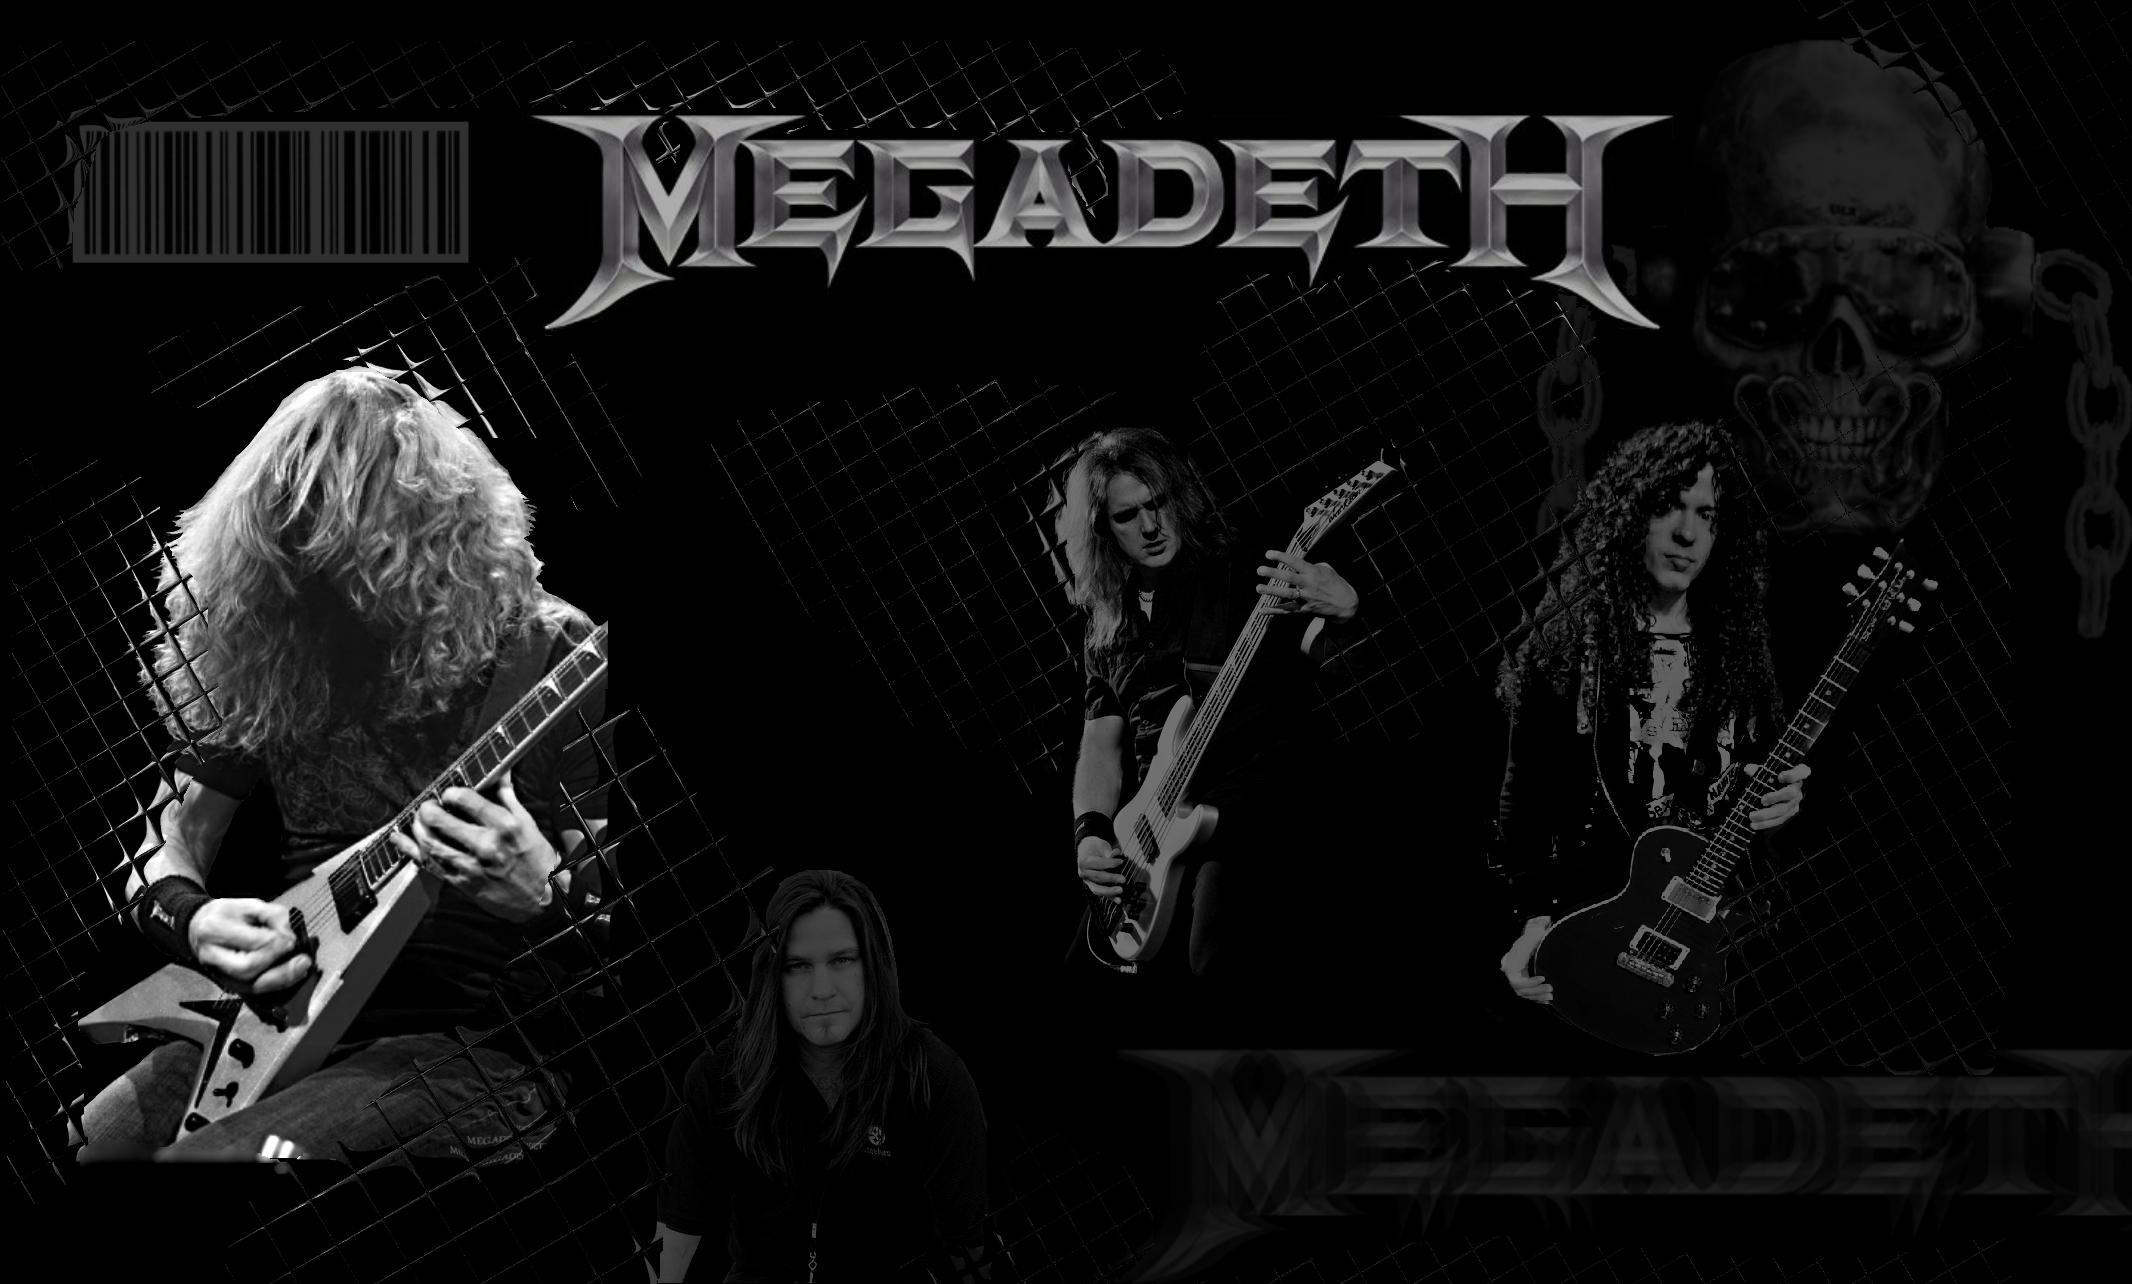 Megadeth Wallpaper – Megadeth Photo (23008076) – Fanpop